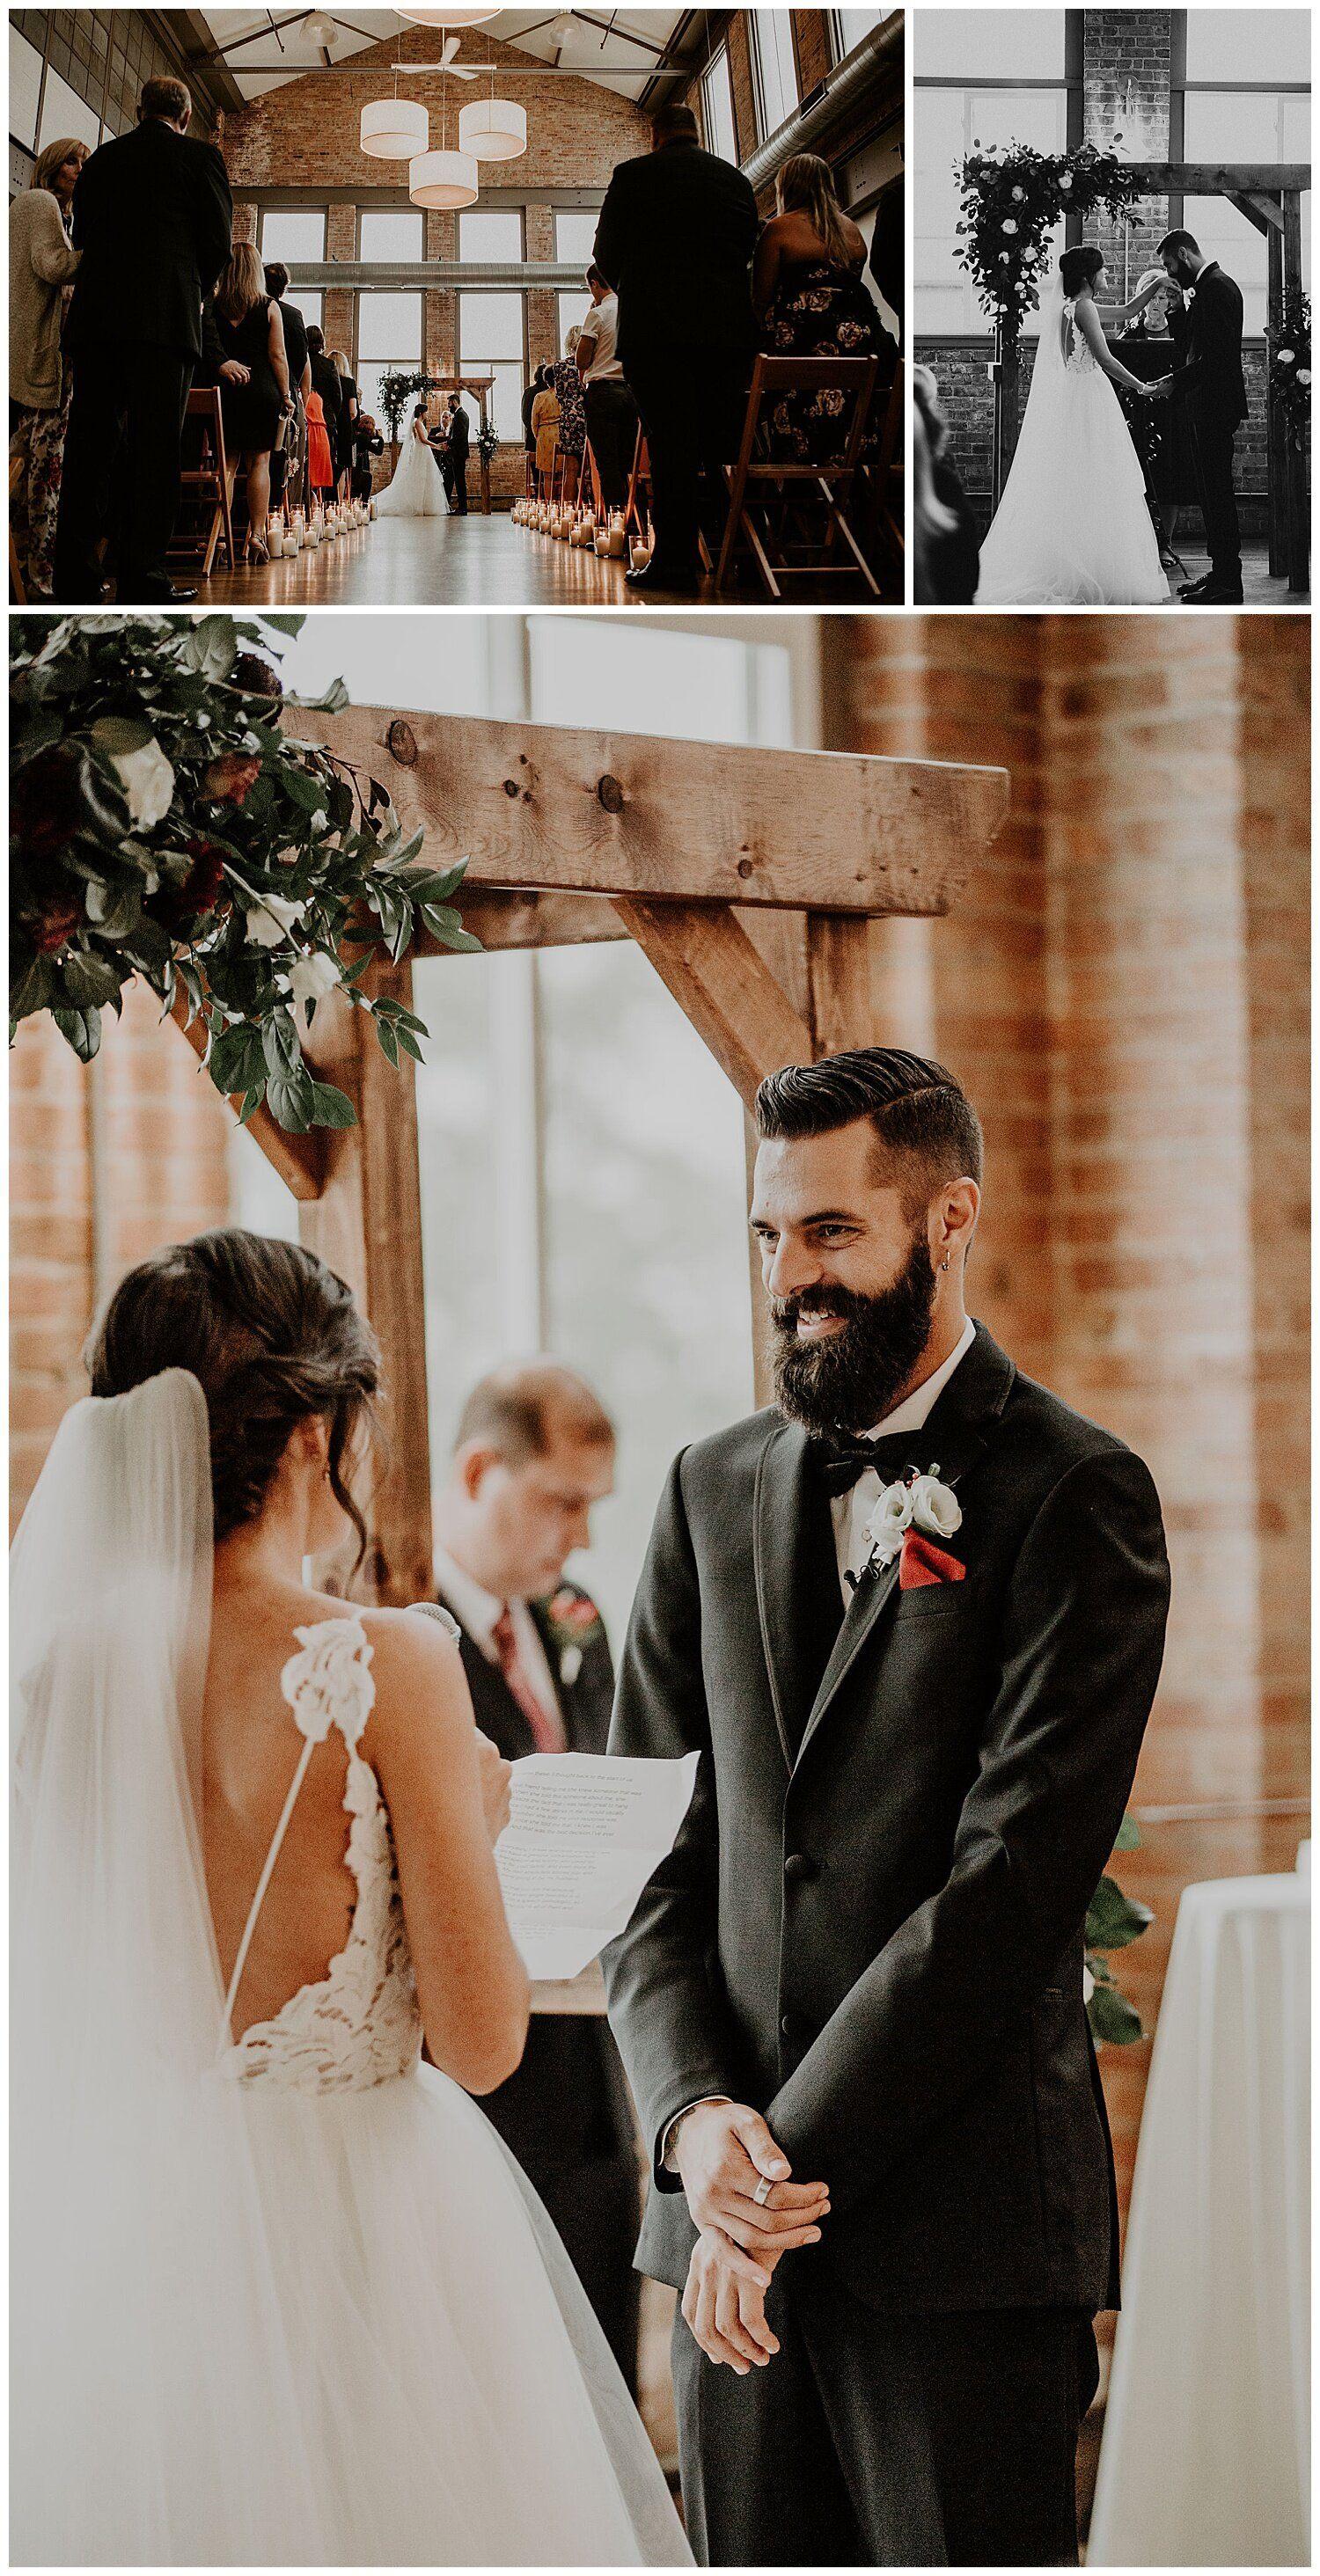 Chicago Il Wedding At City View Lofts Megan Matt Mari Trancoso In 2020 Chicago Wedding Photography Loft Wedding Wedding